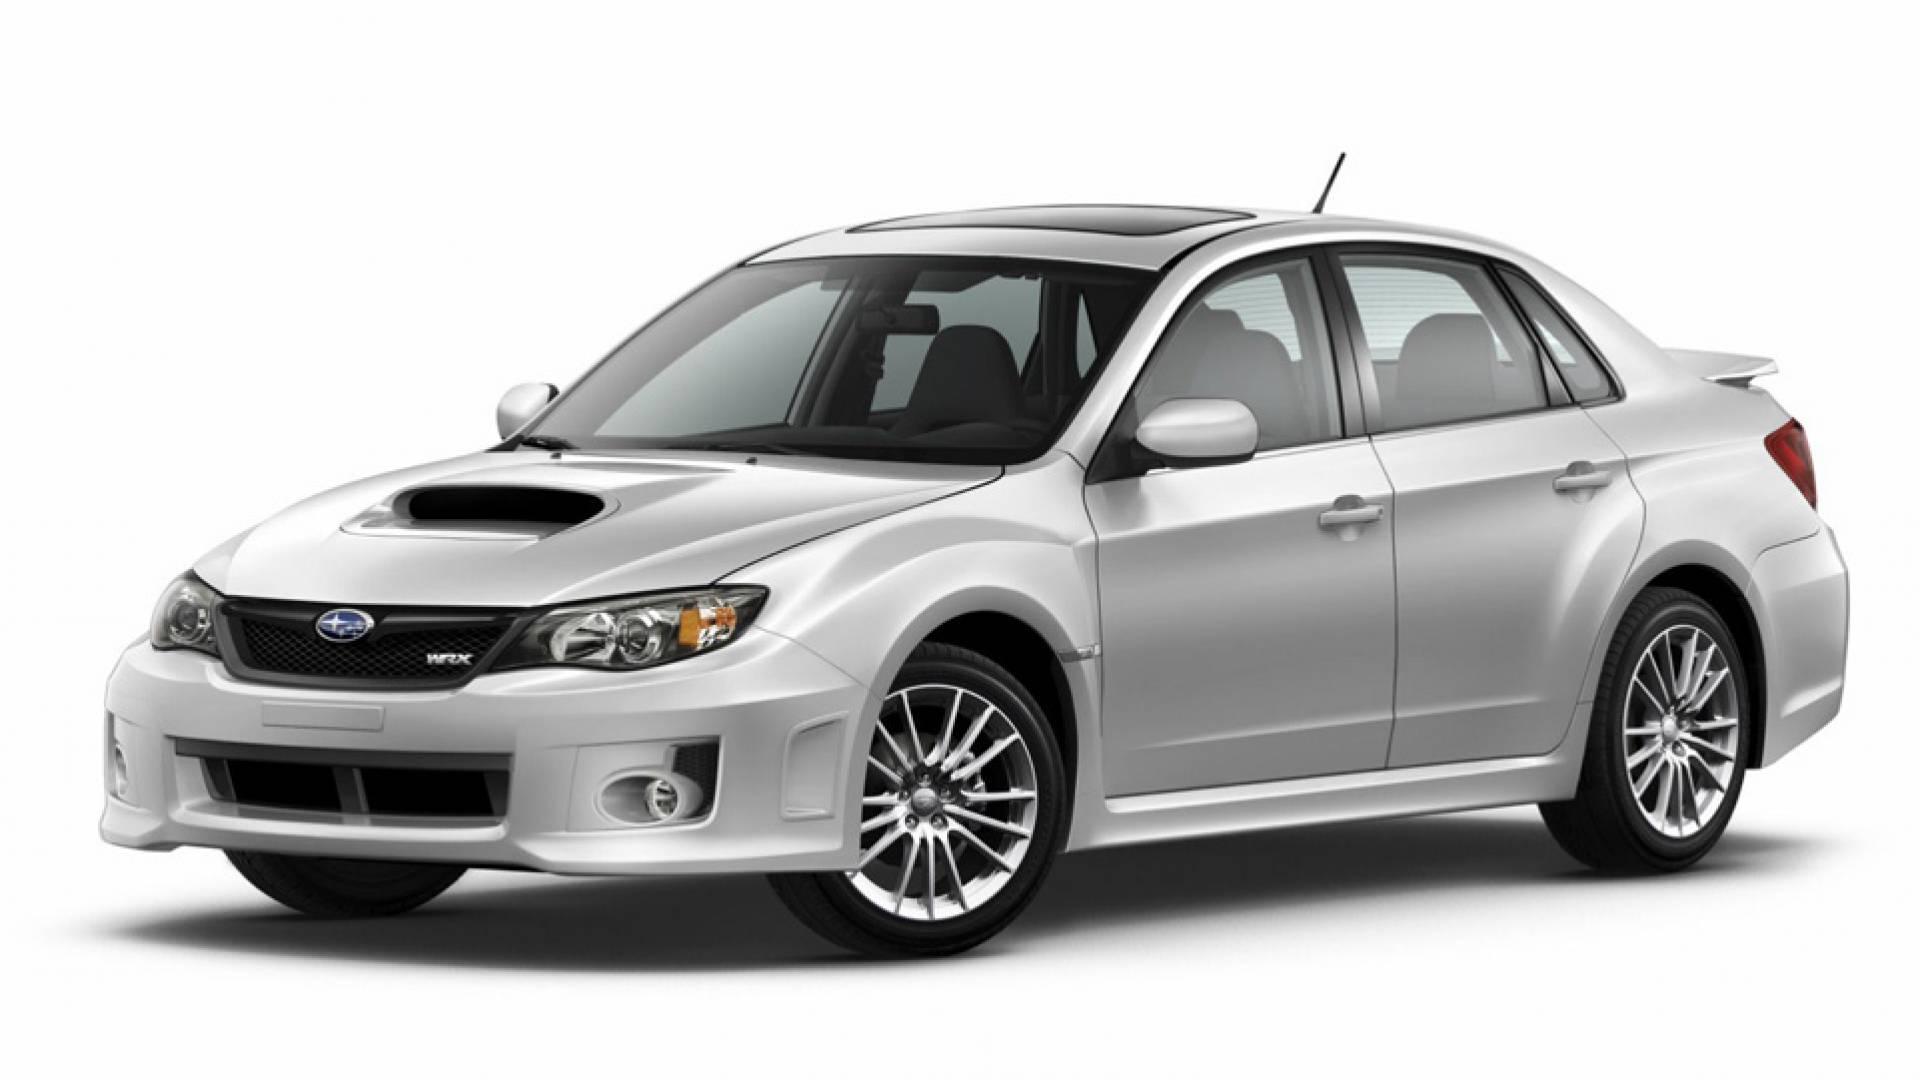 Subaru Impreza WRX STI Sedán